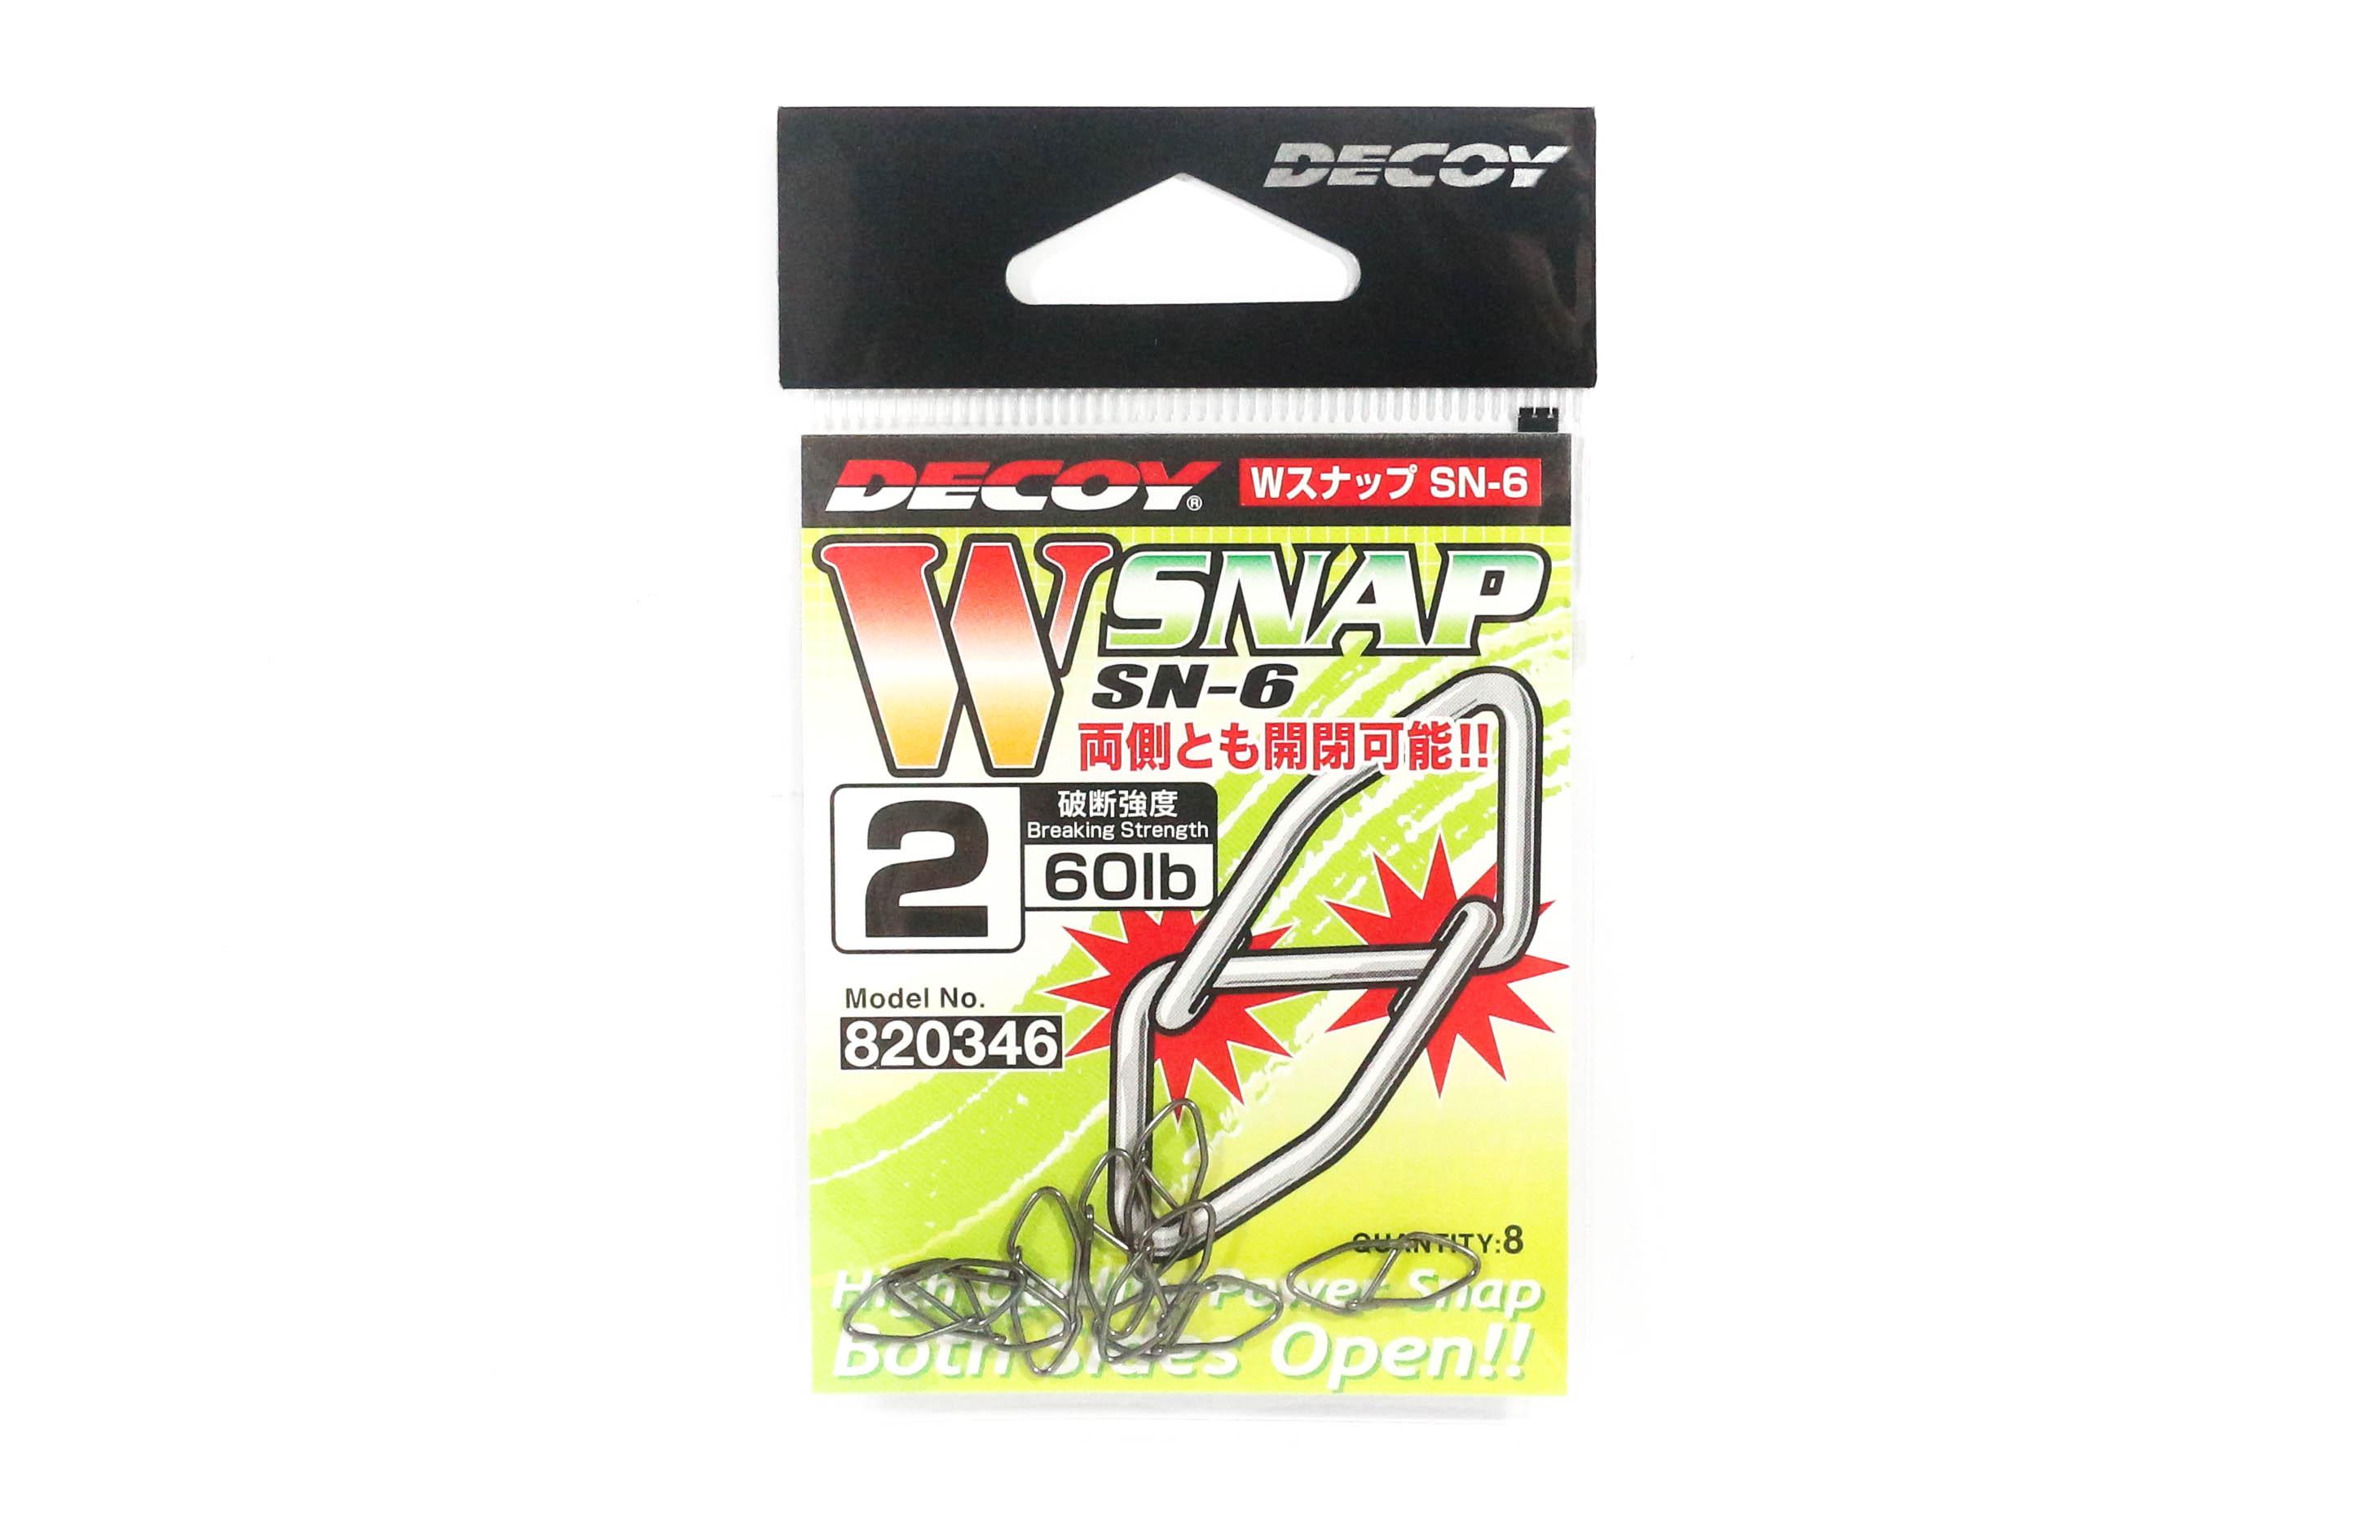 0346 Decoy SN-6 W Snap Powerful Dual Snap Size 2